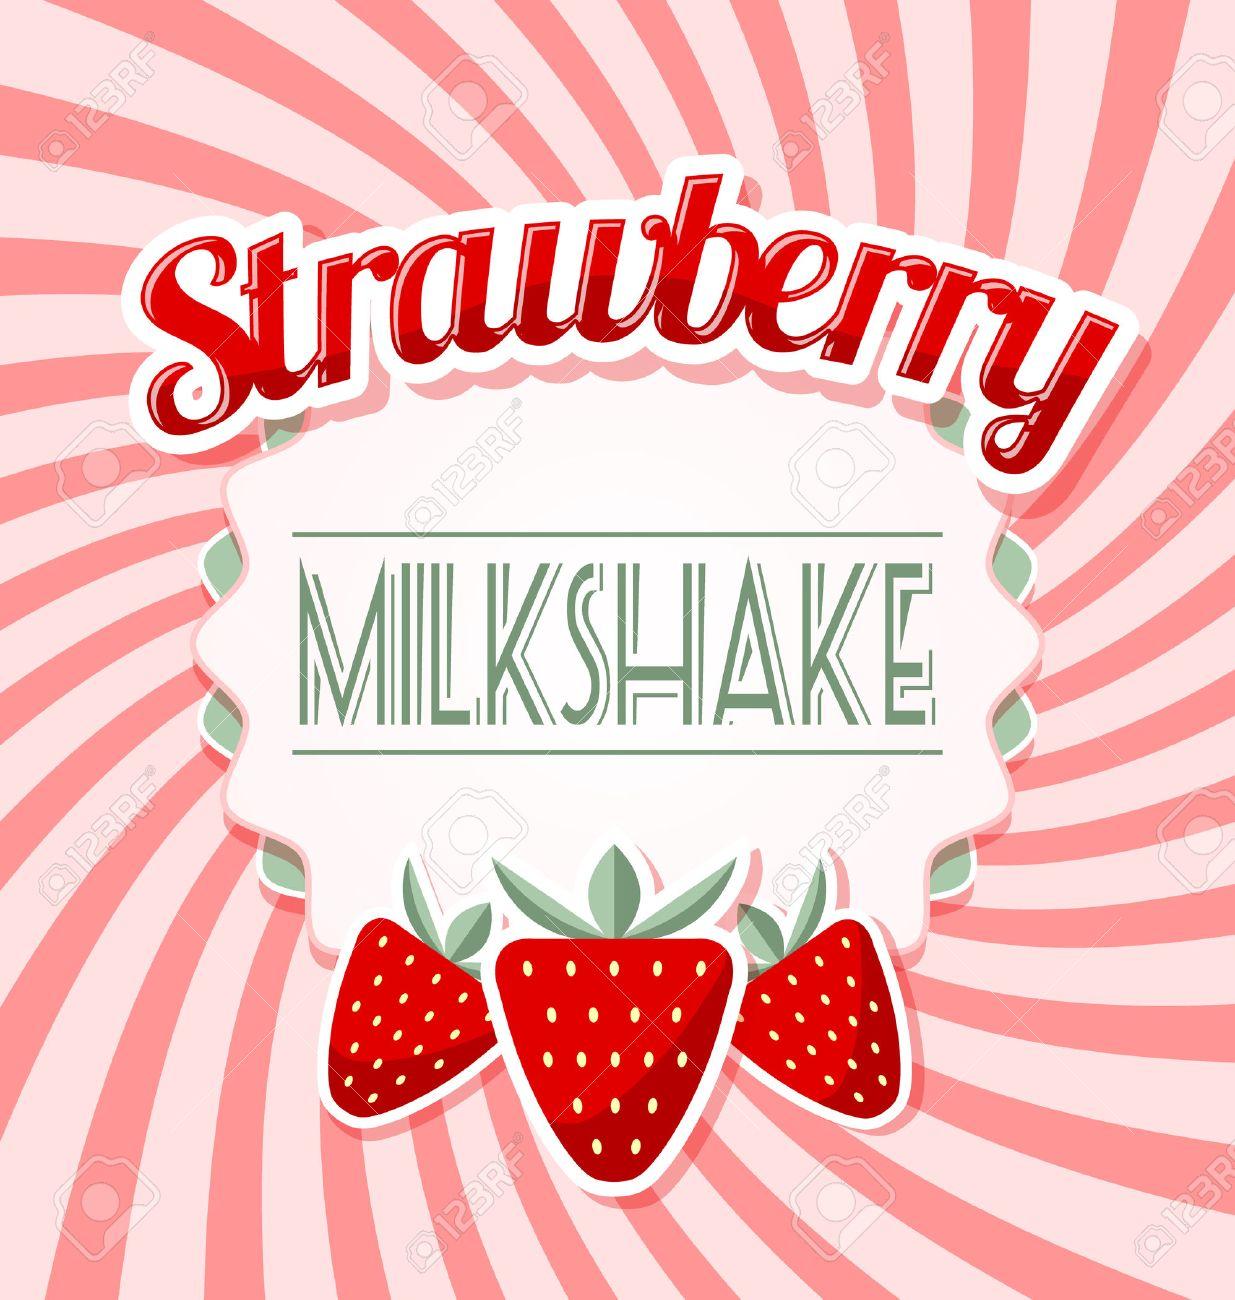 Milk-shake Vector Set Stock Vector - Image: 41542066